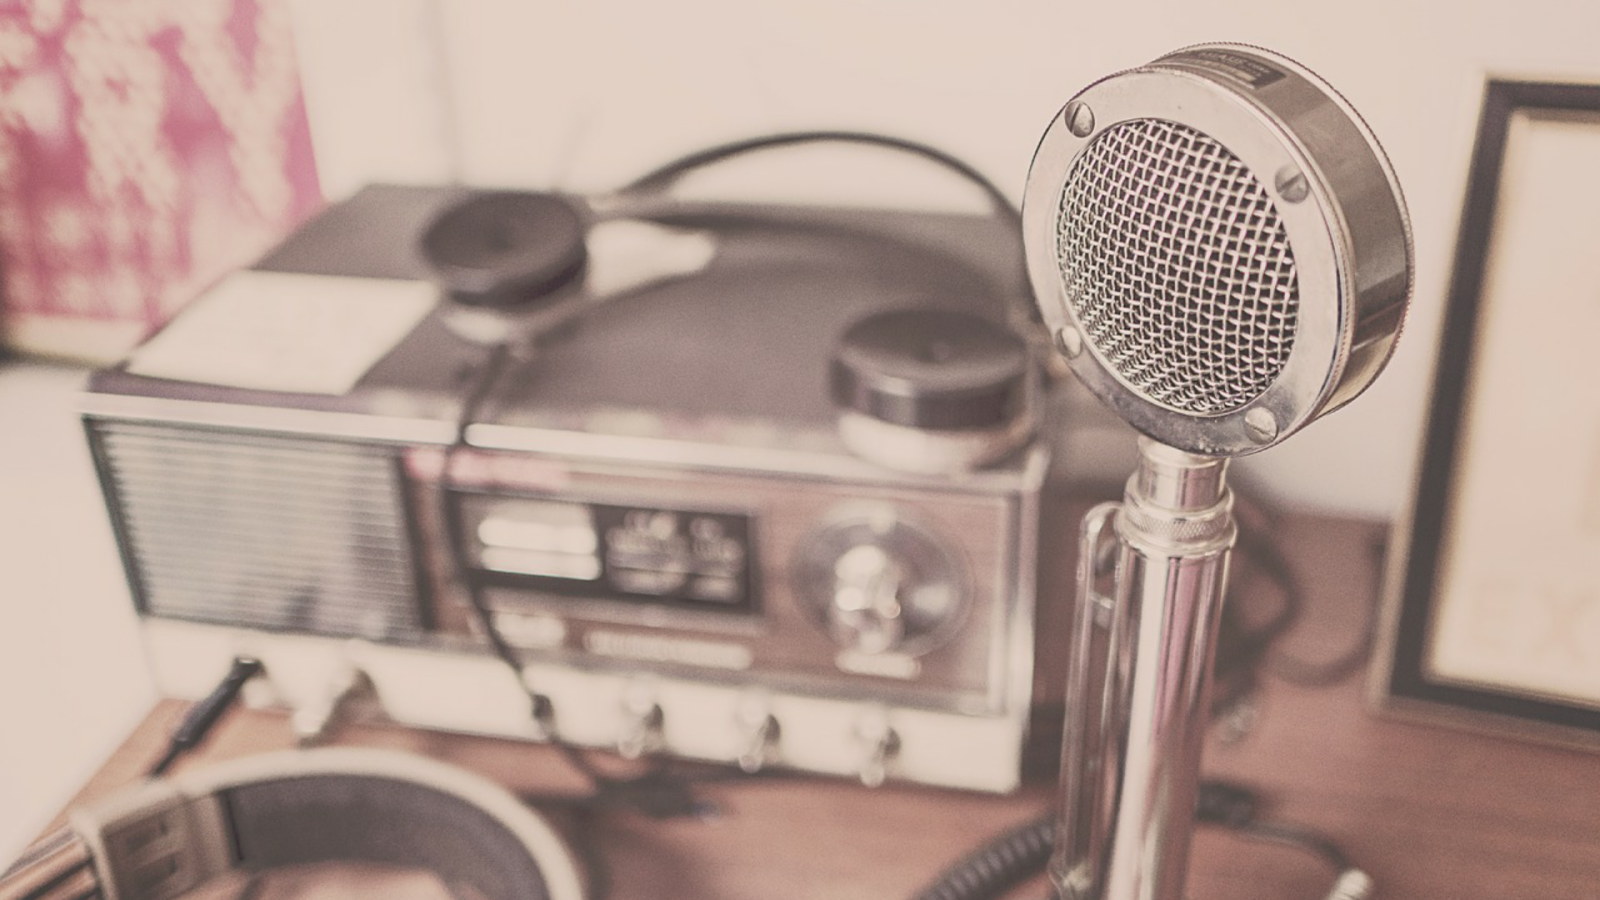 Fallo de sistema - 407: La radio. Siempre la radio... - 31/05/20 - escuchar ahora